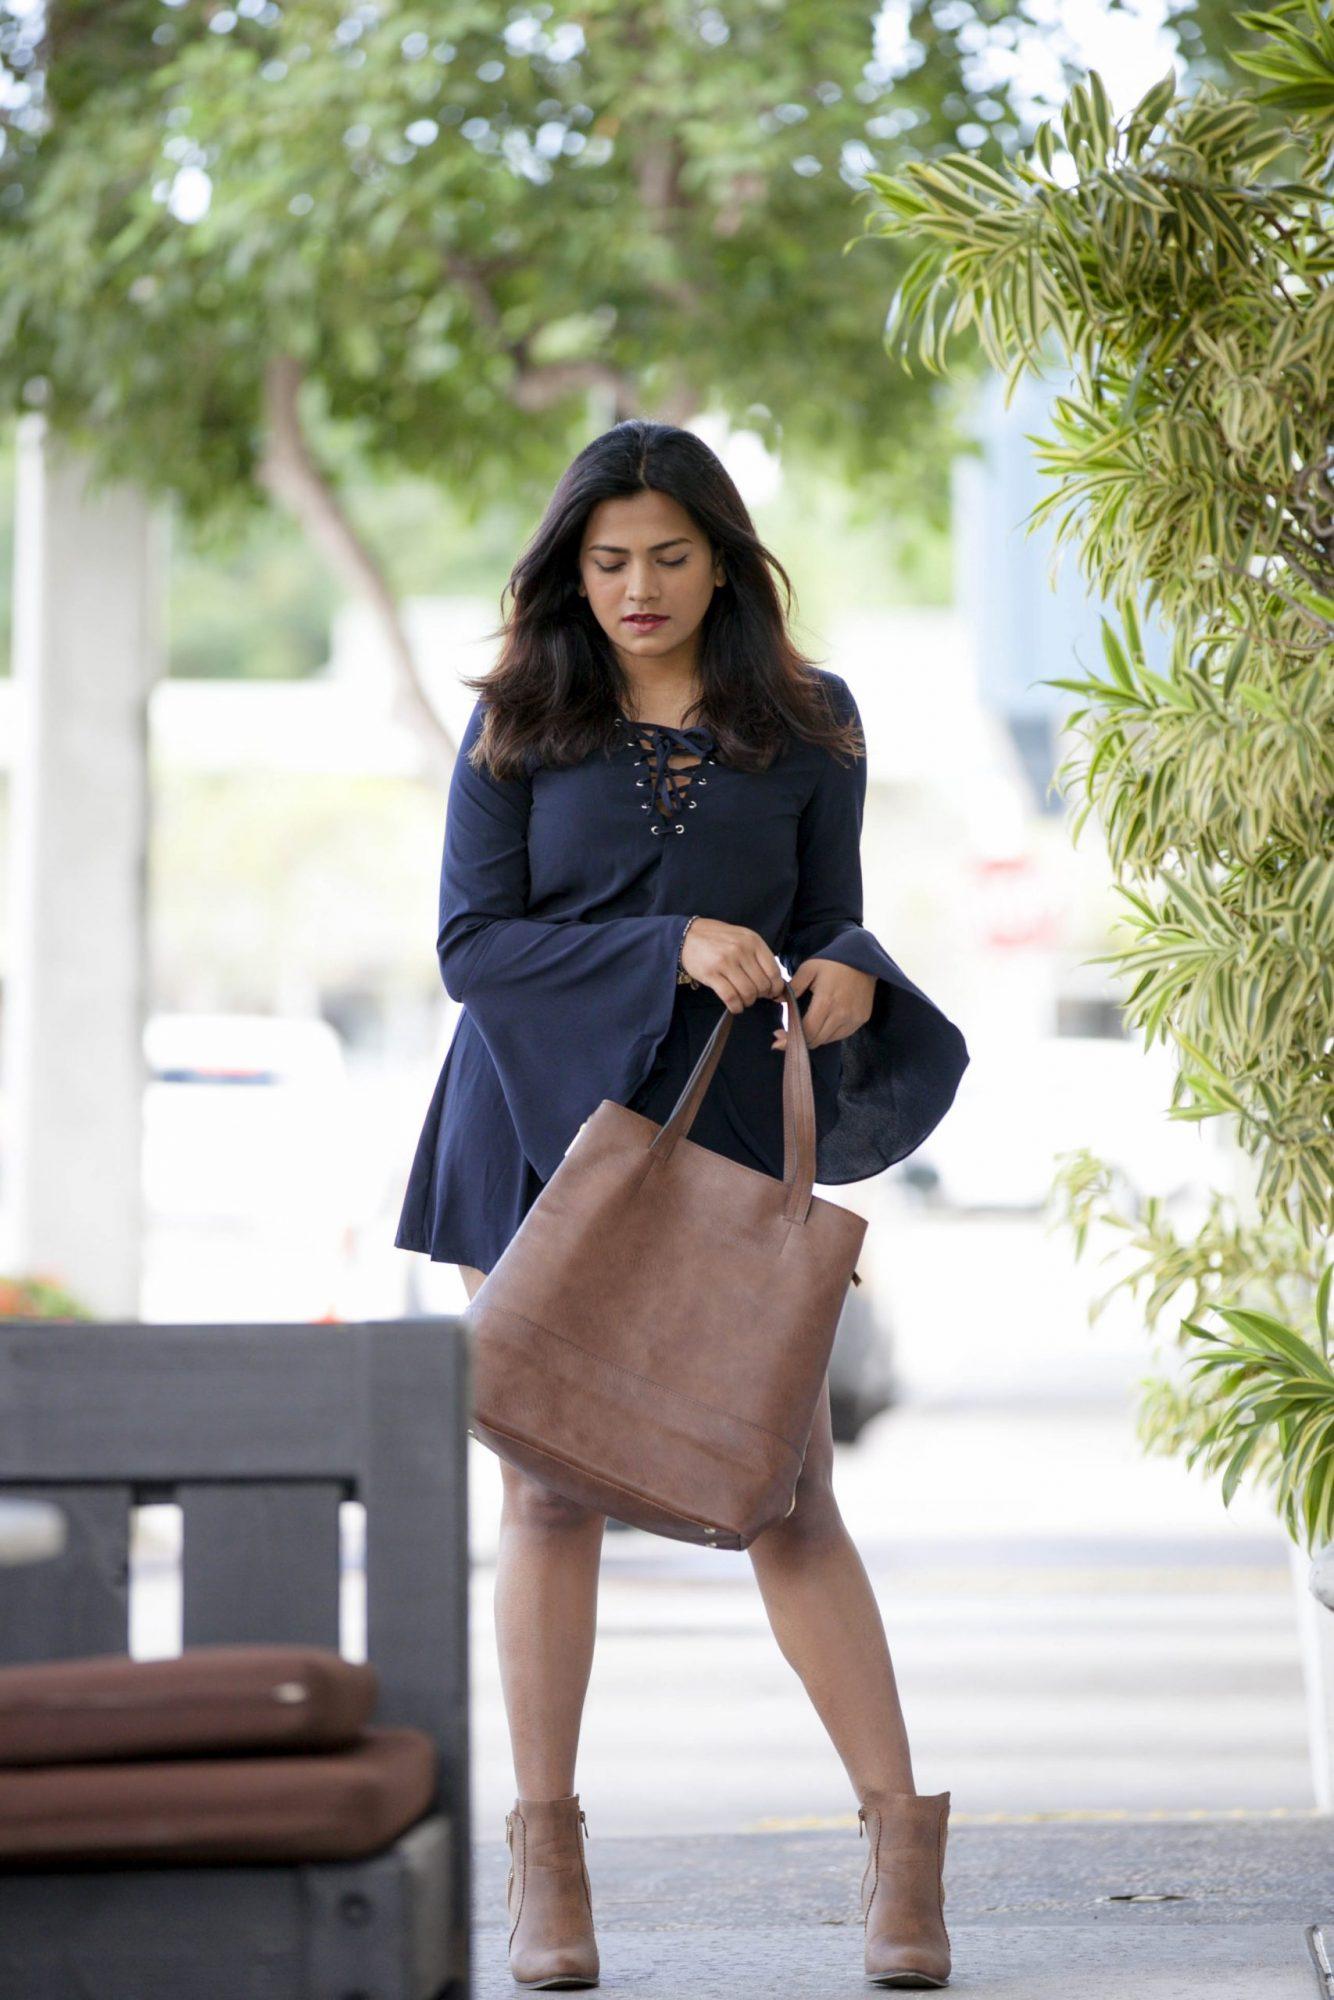 Miami Influencer Afroza Khan